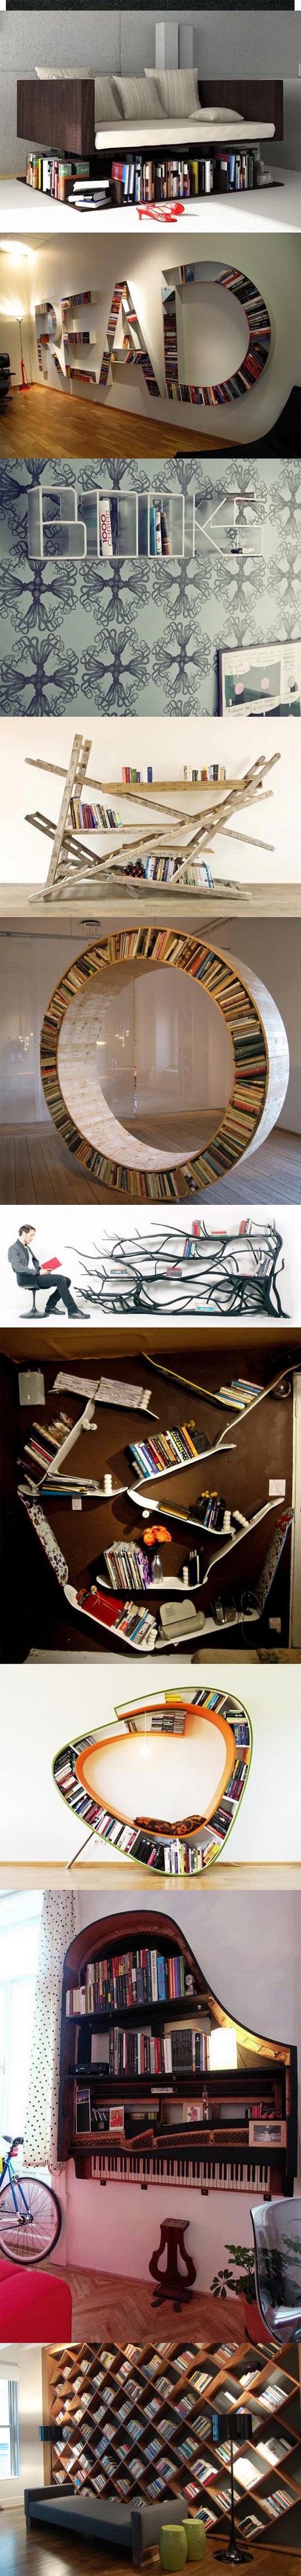 funny-books-shelf-stairs-wood-furniture-infinity